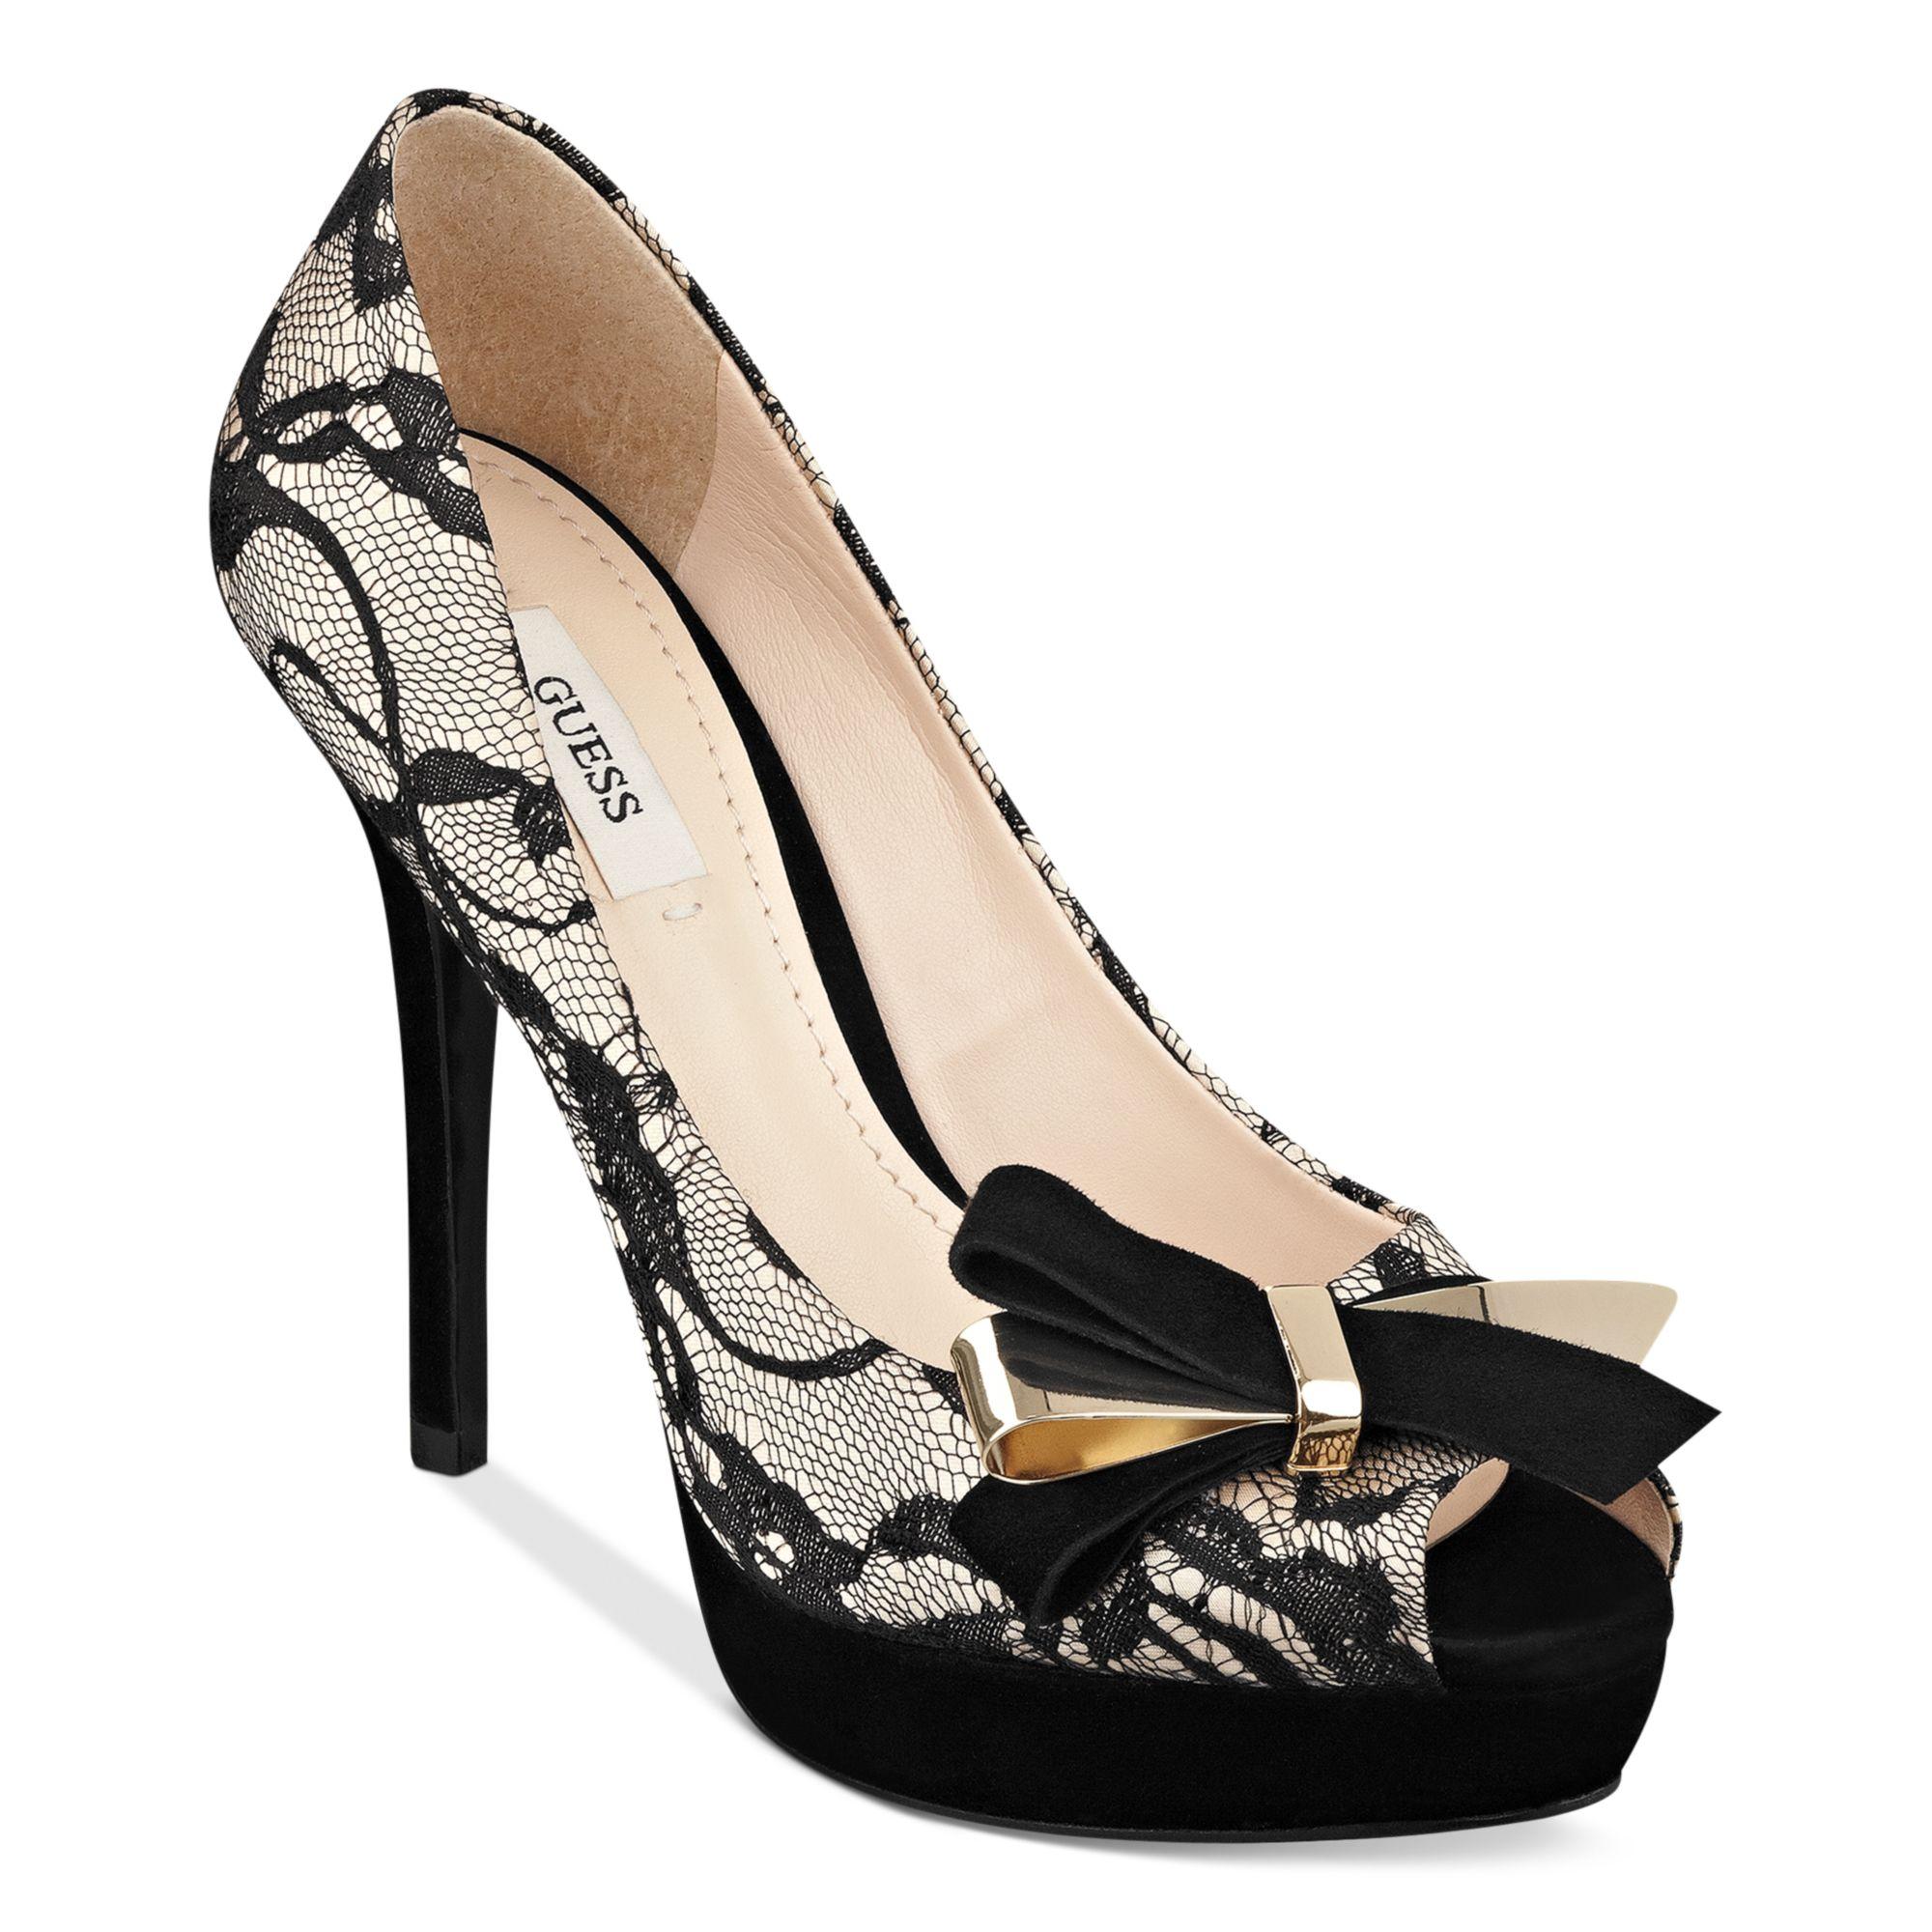 guess shoes tulle platform pumps in beige black lace lyst